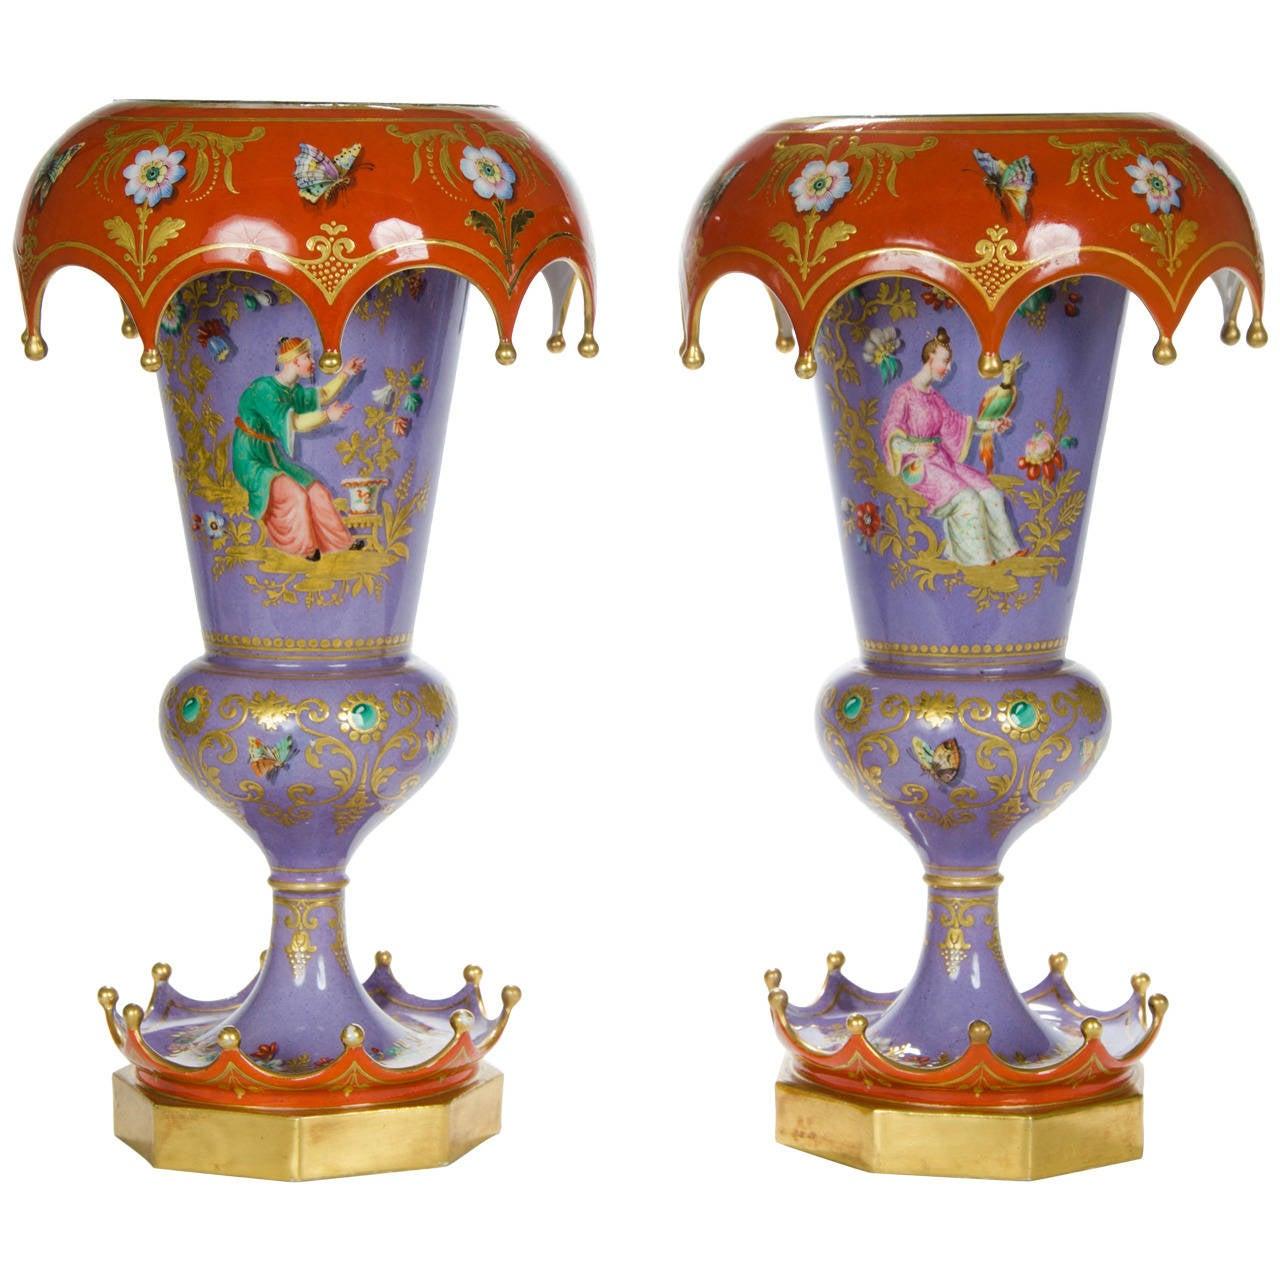 Rare Pair of Chinoiserie Vases, French, circa 1840